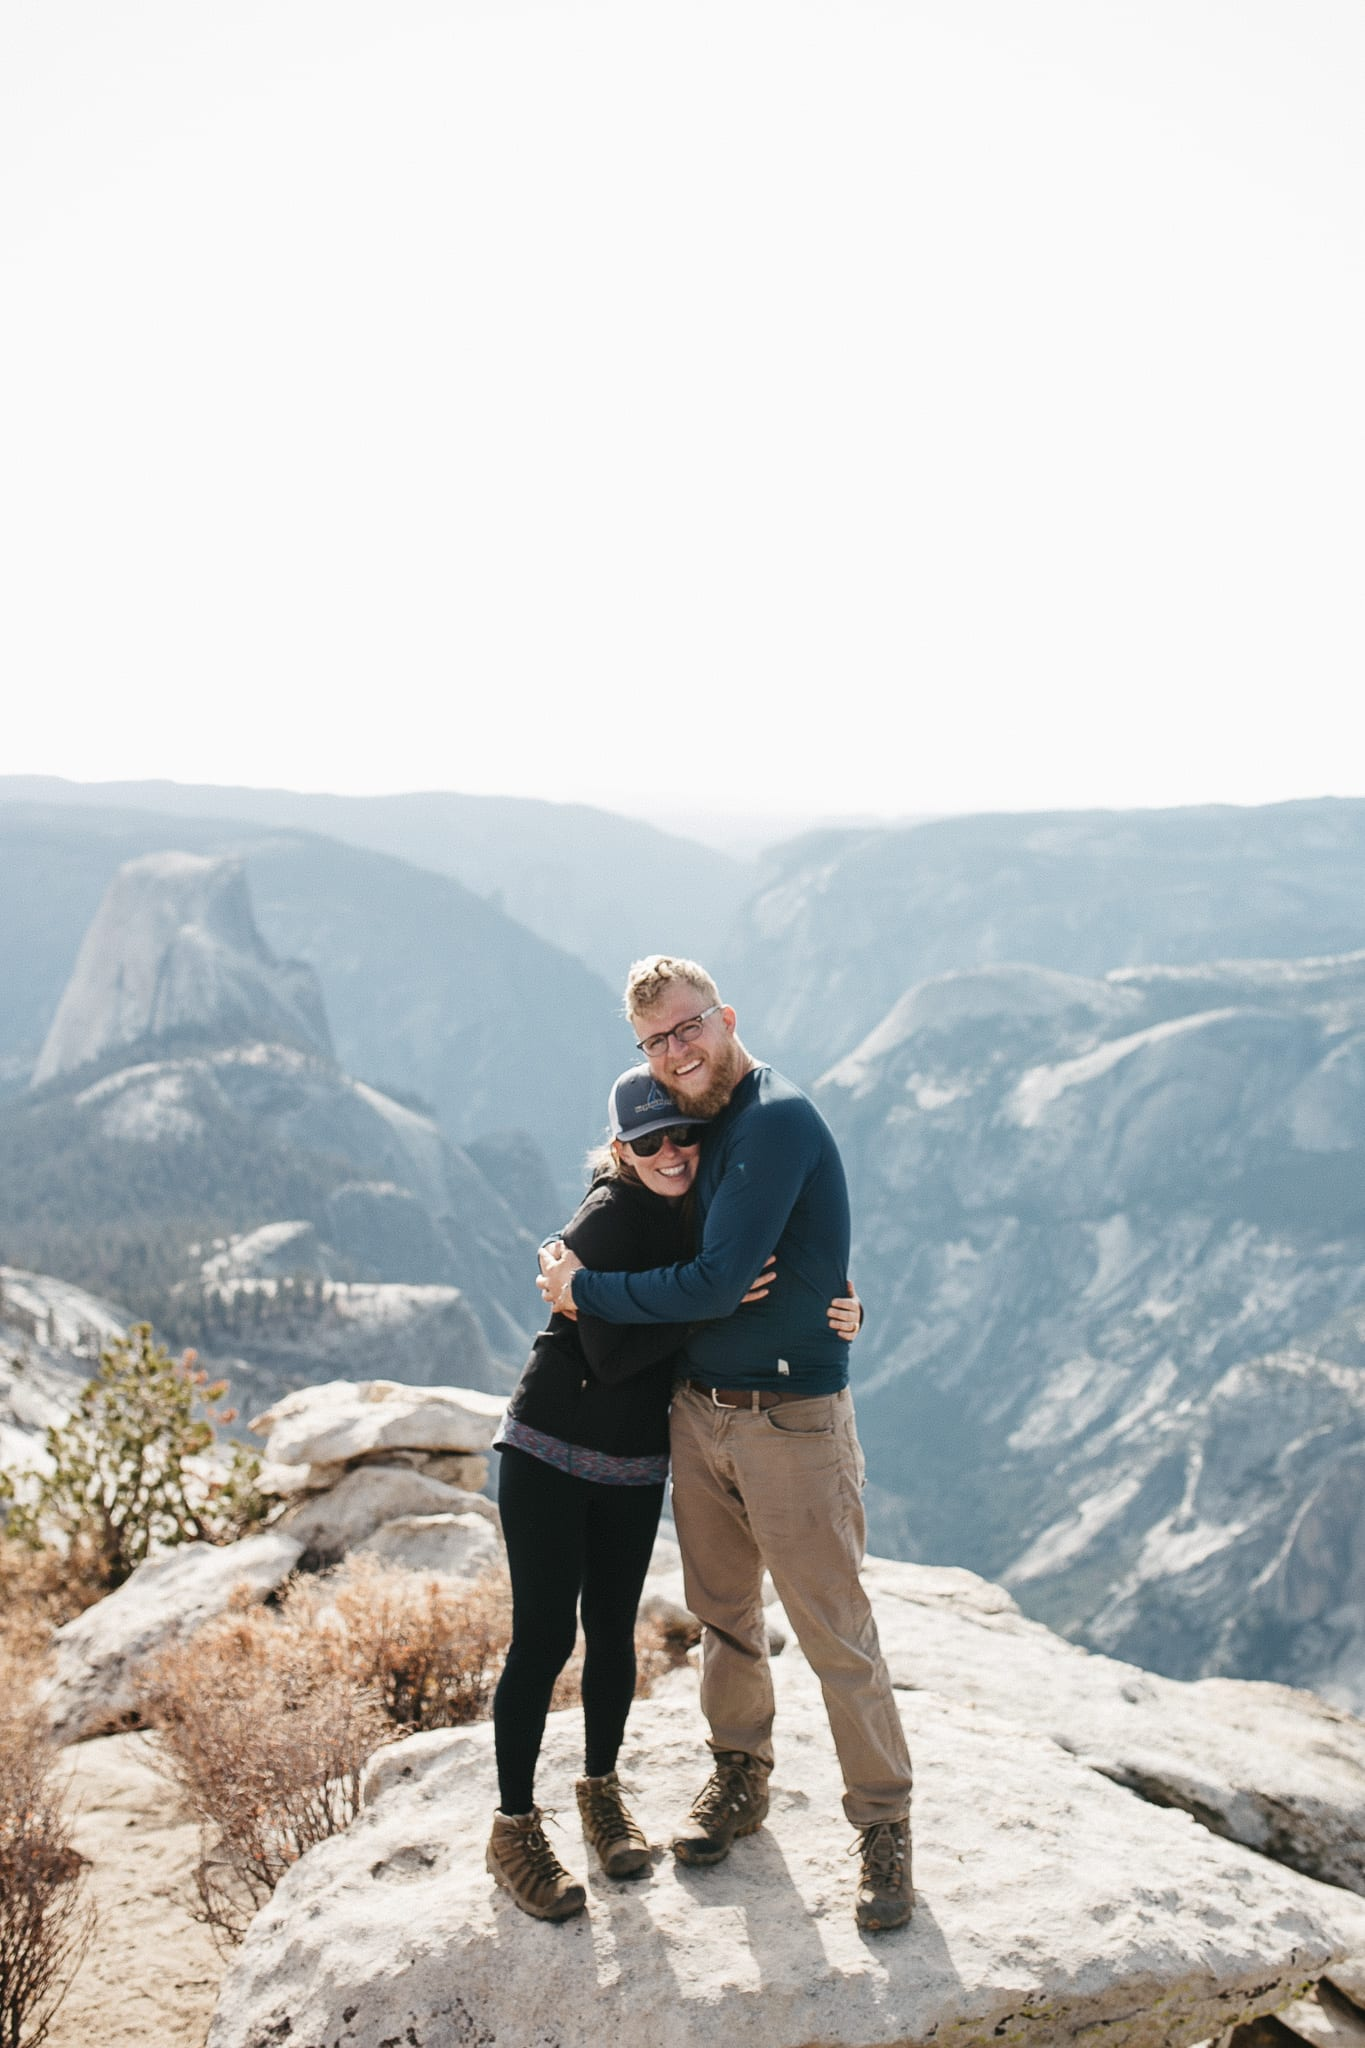 clouds-rest-yosemite-california-engagement-lifestyle-adventure-photographer-15